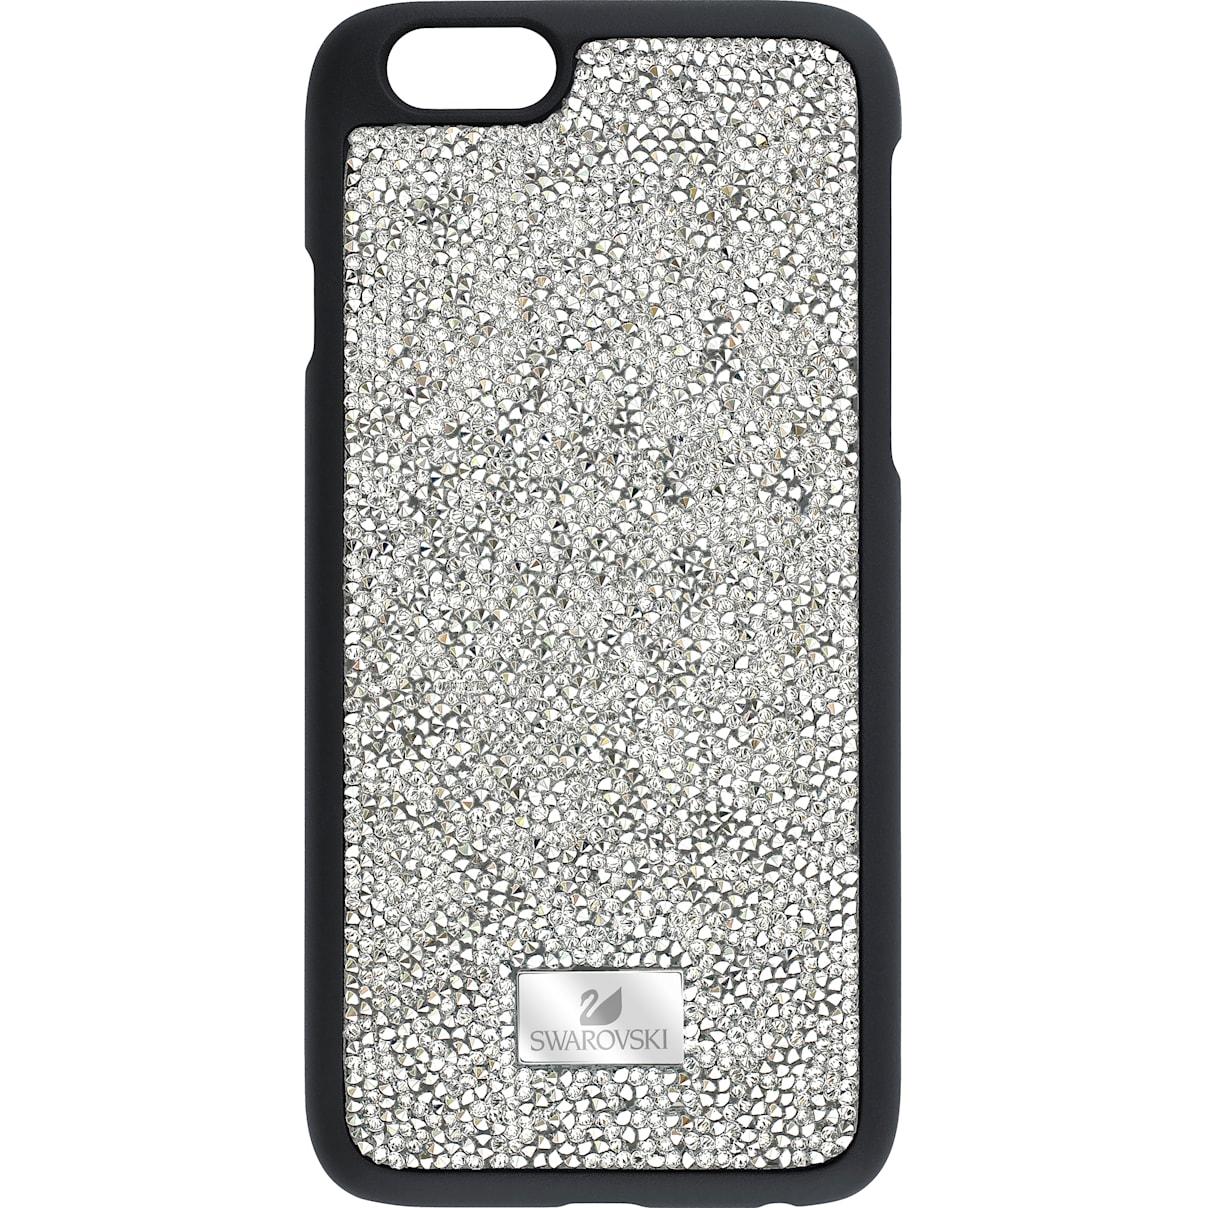 Swarovski Glam Rock Gray Smartphone Case, iPhone® 6/6s